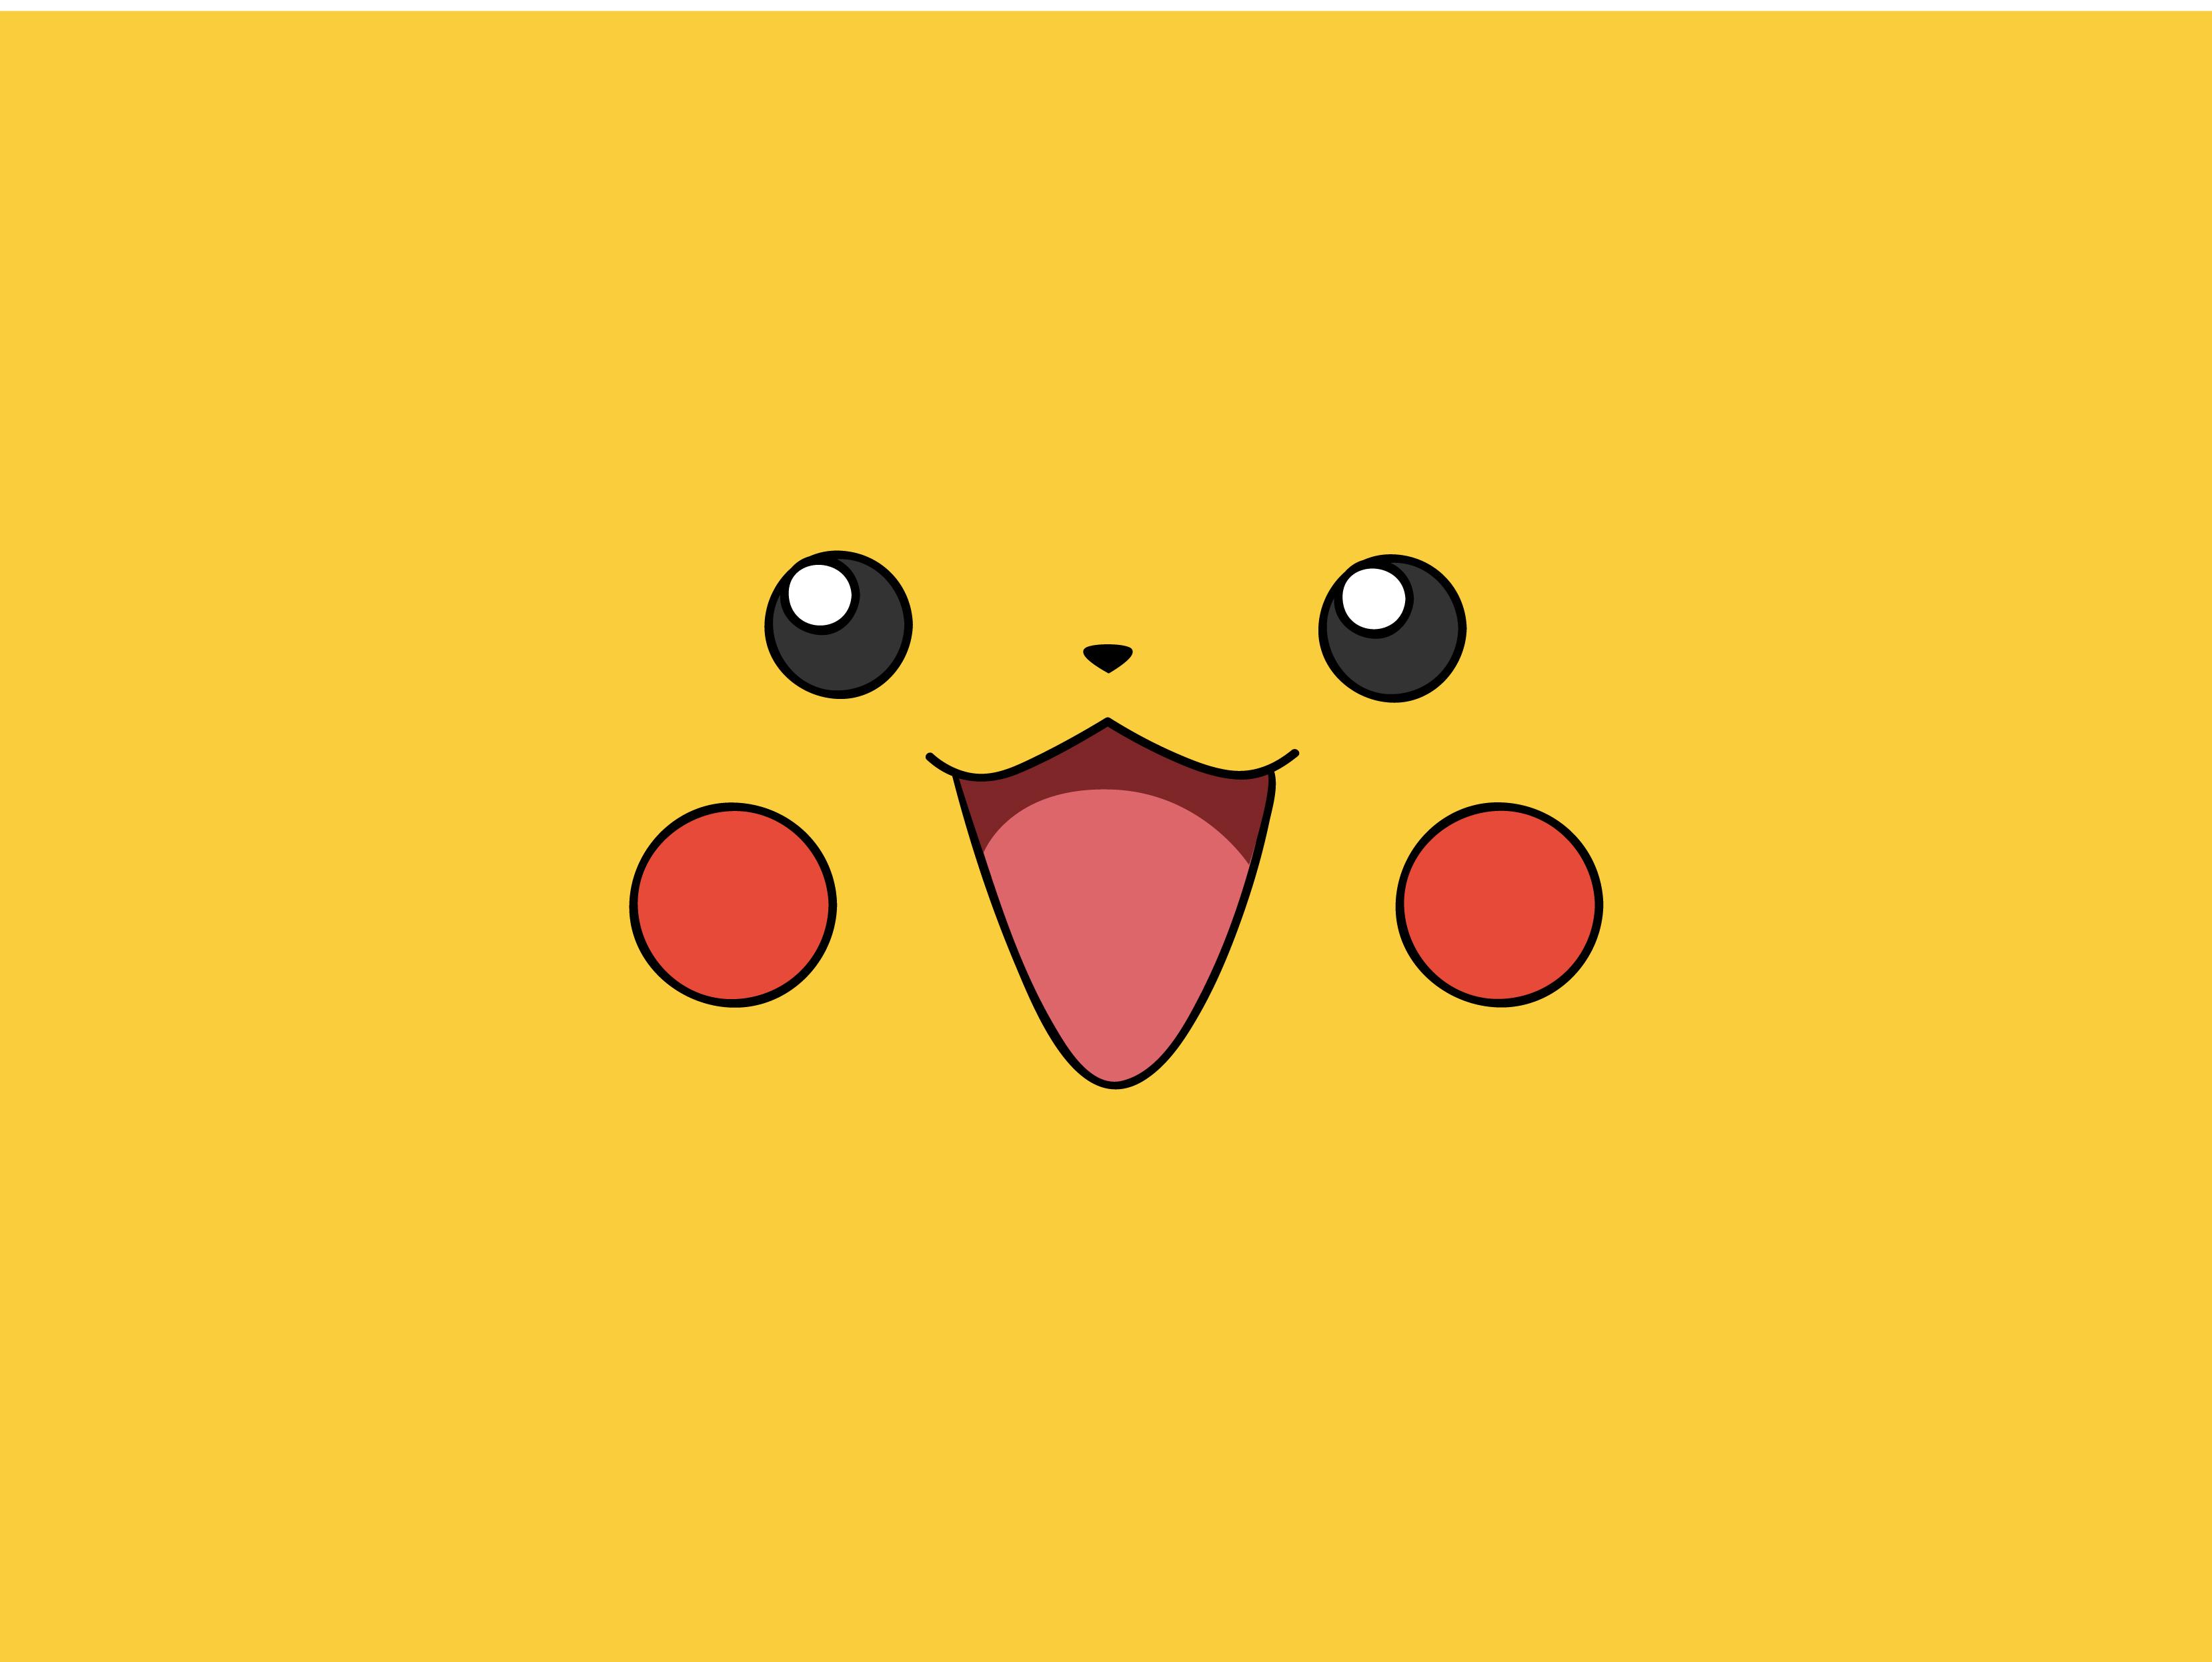 Wallpaper - Pikachu